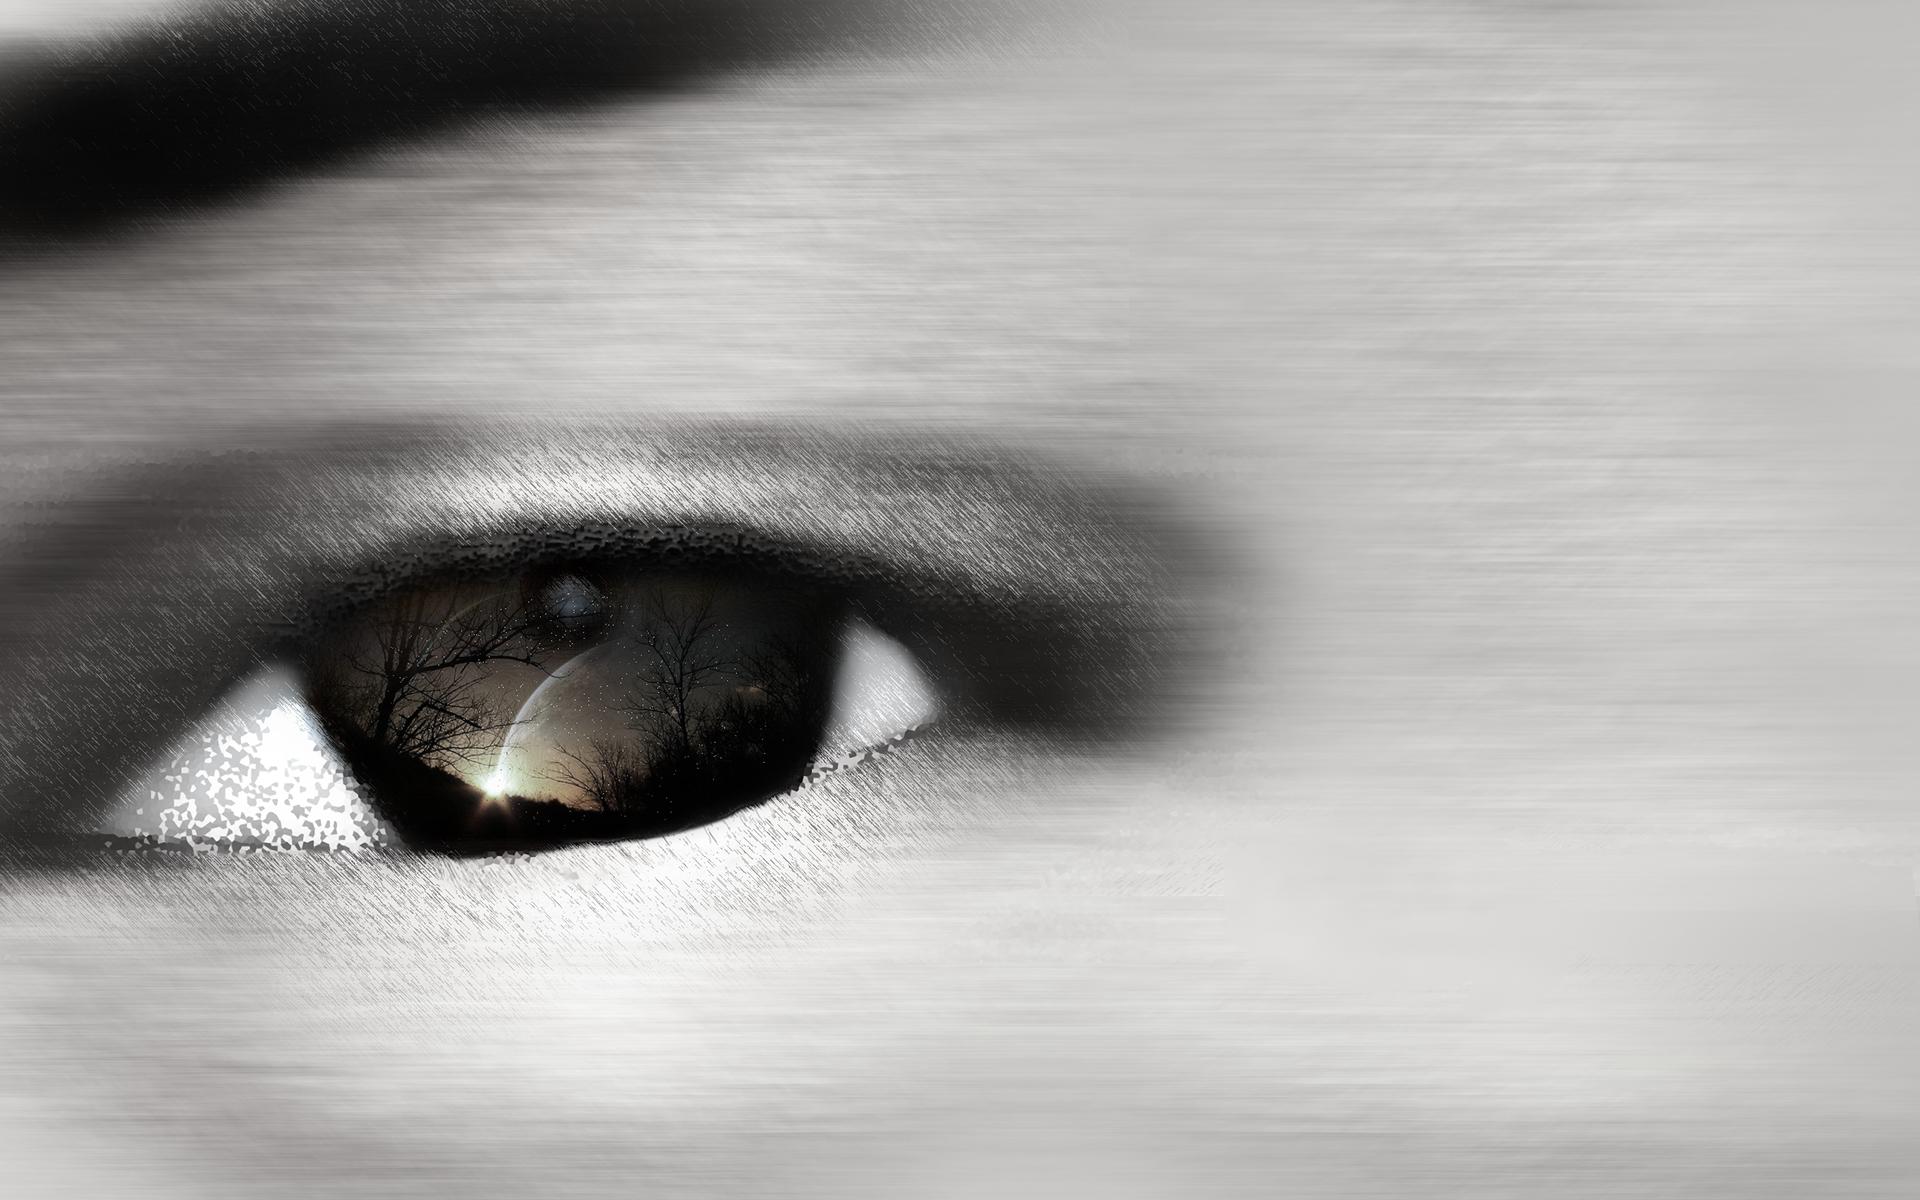 eye488454 BACKGROND